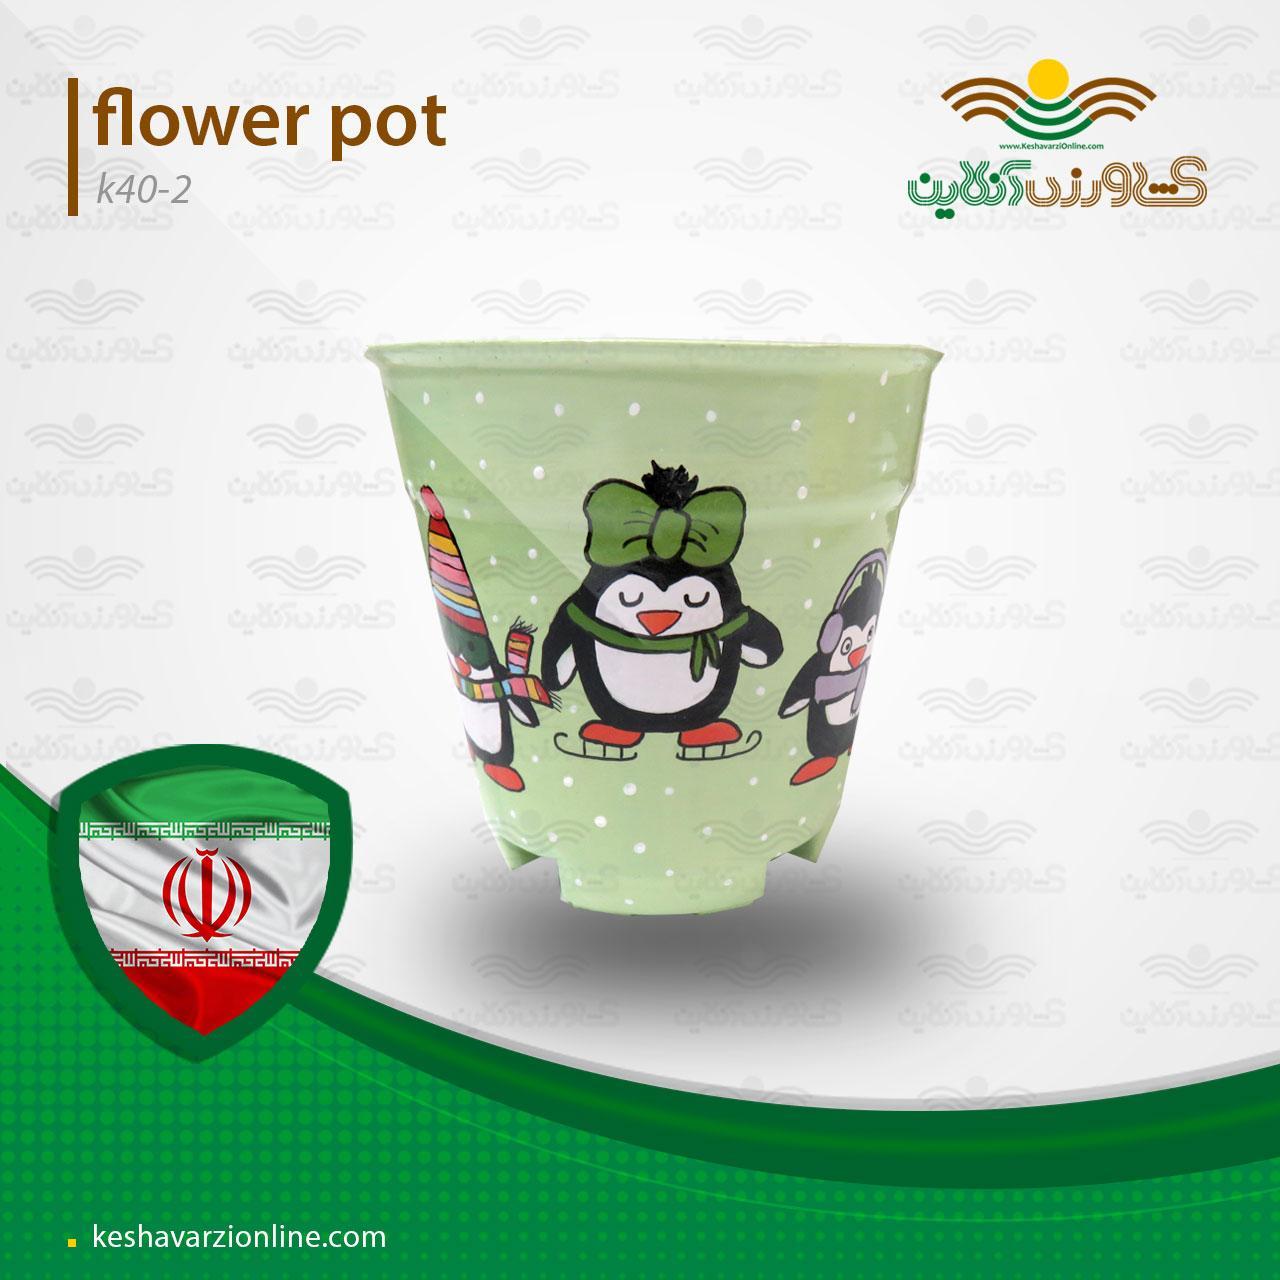 گلدان دکوری K40.2